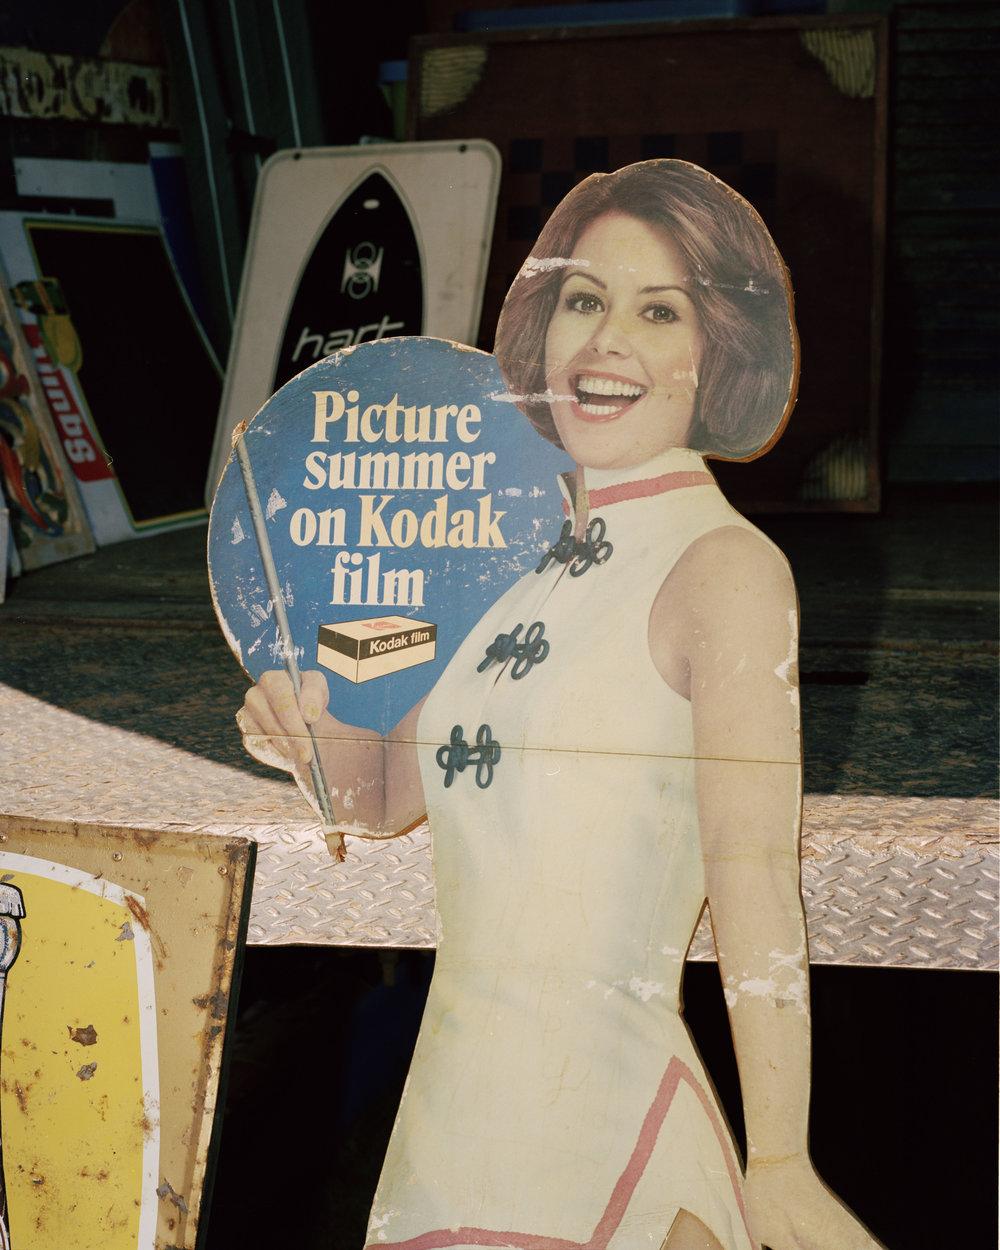 picture summer on kodak film.jpg